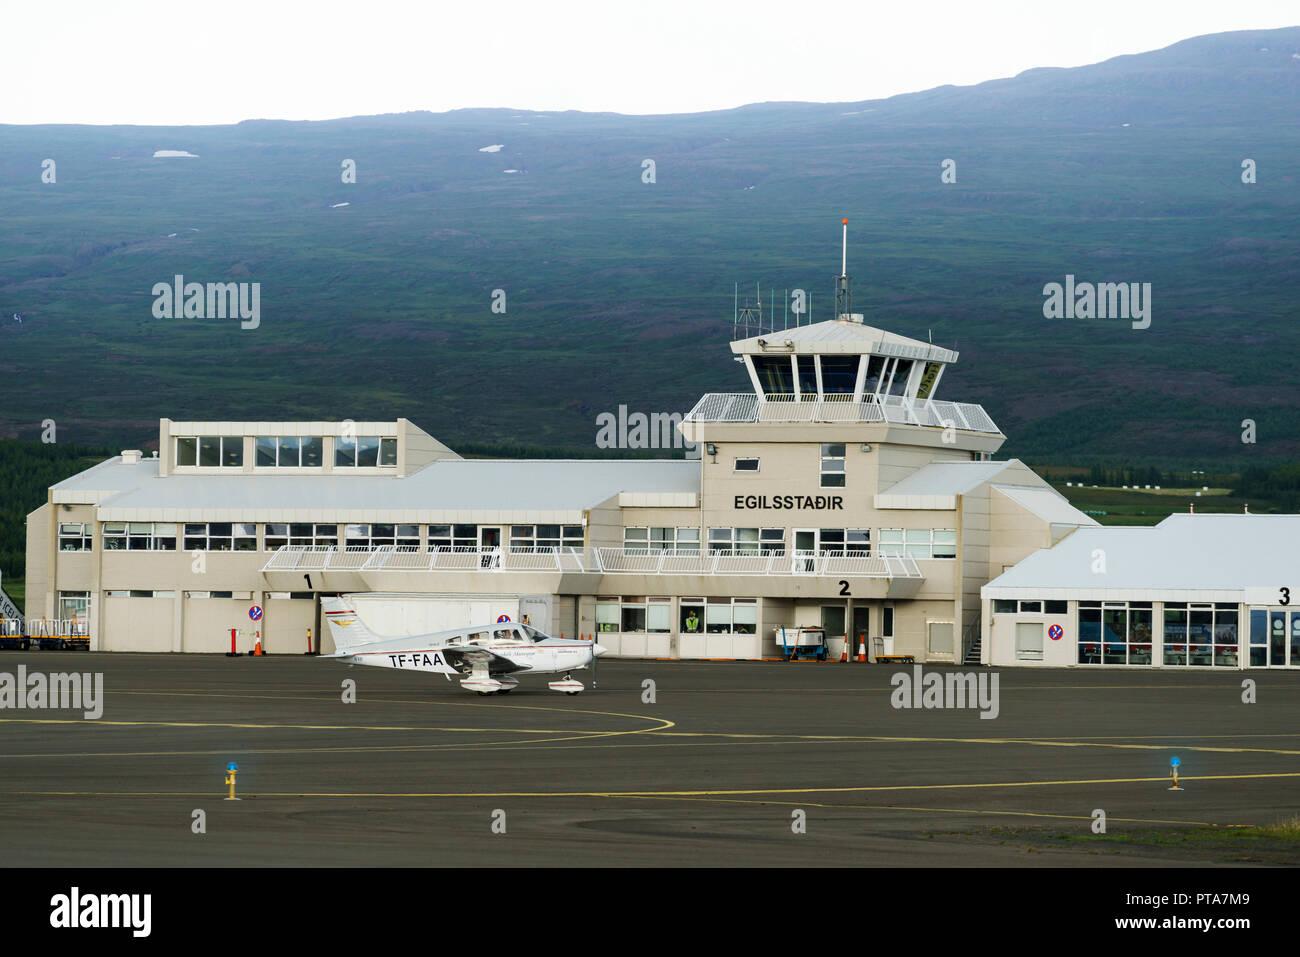 Egilsstadir Airport, Egilsstadir Eastern, Iceland - Stock Image